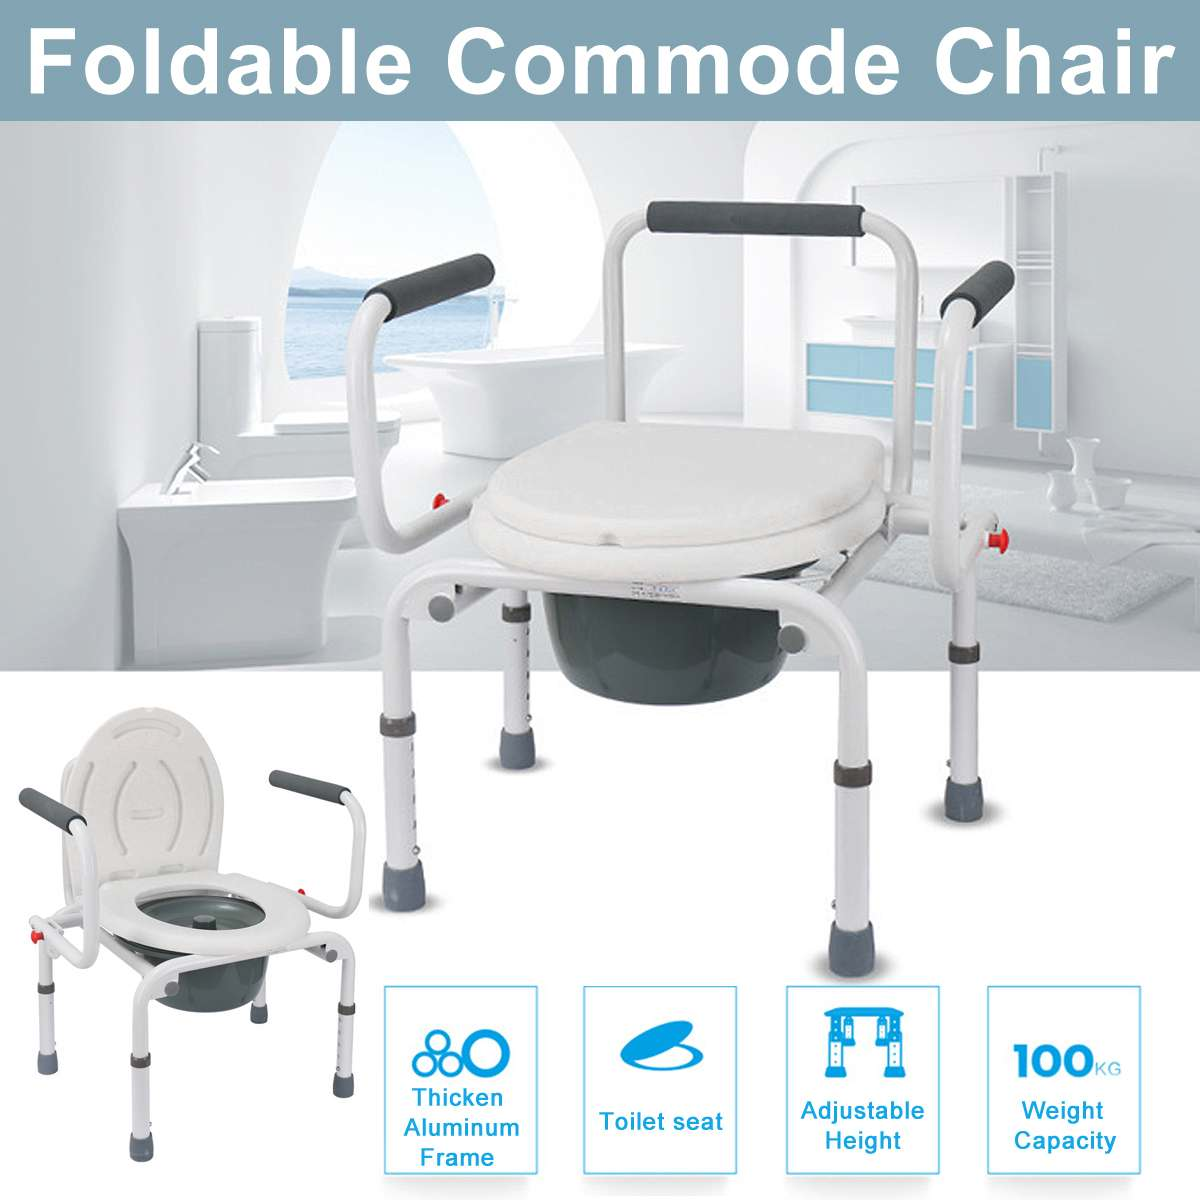 Adjustable Height Commode Wheelchair Bedside Toilet & Shower Seat Bathroom Chair Elder Folding Chair Waterproof